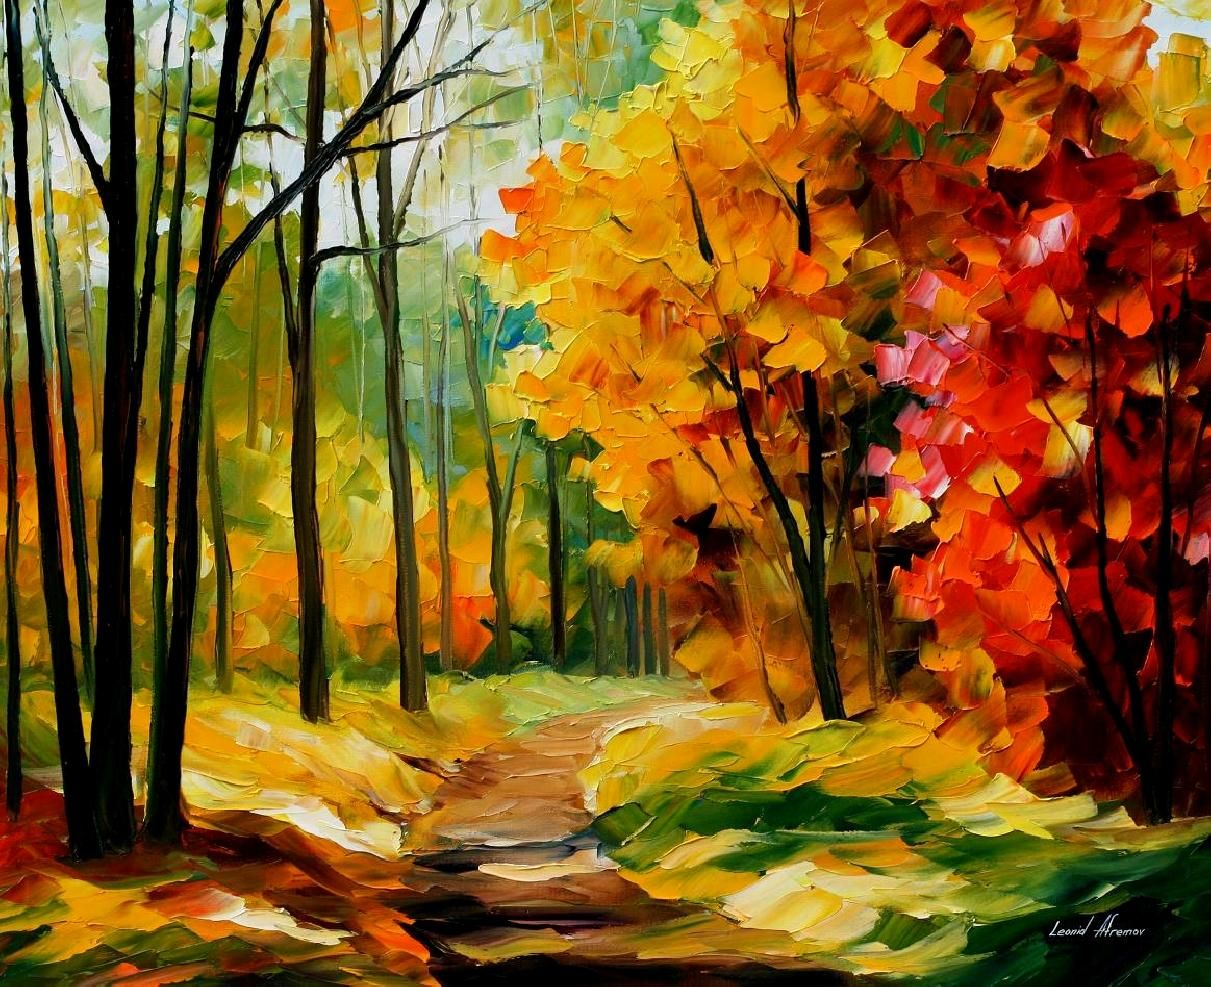 Leonid Afremov Oil On Canvas Palette Knife Buy Original Paintings Art Famous Artist Biography Official Pa Landscape Paintings Canvas Art Prints Painting